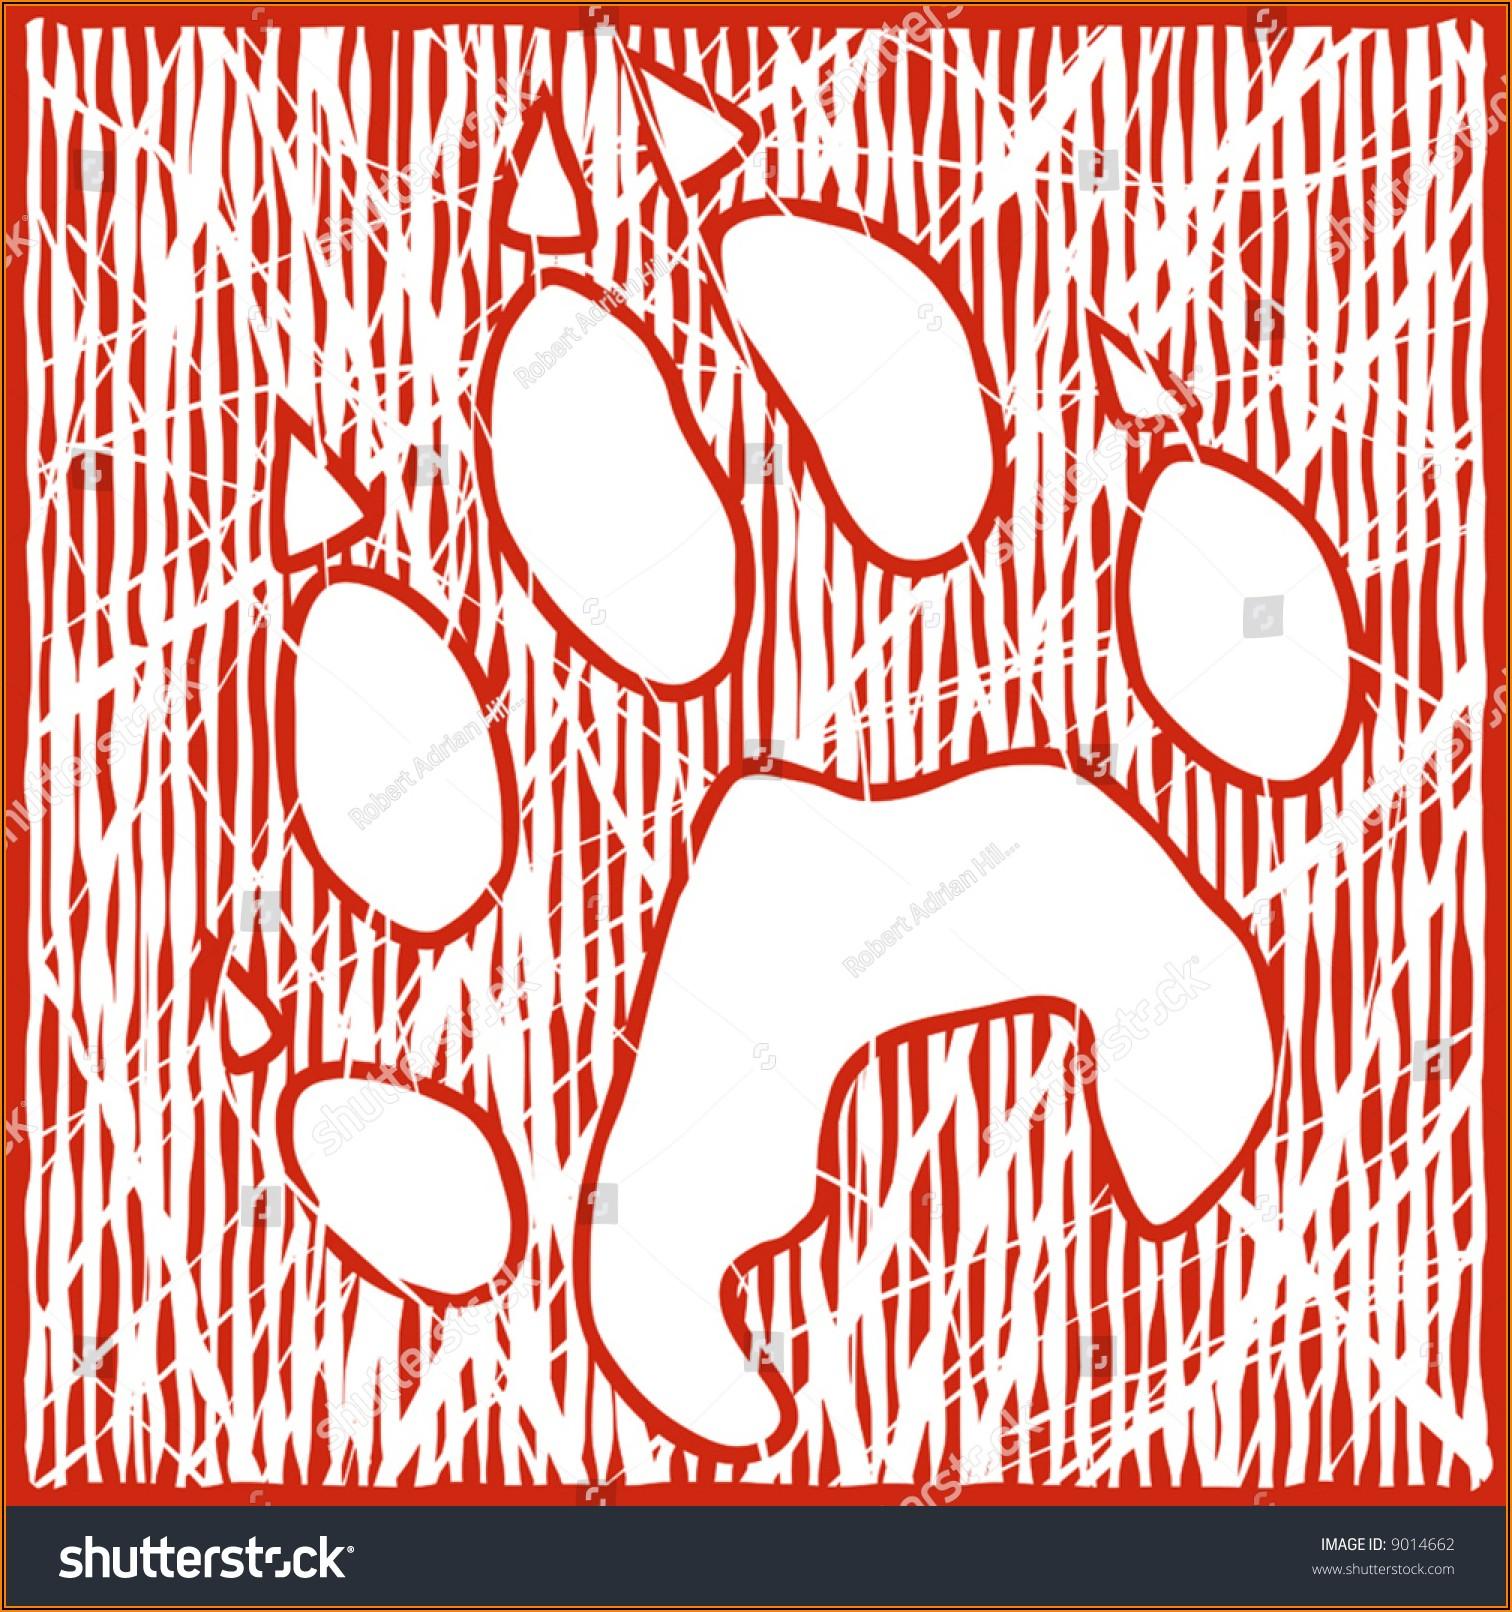 Free Editable Printable Paw Patrol Invitations